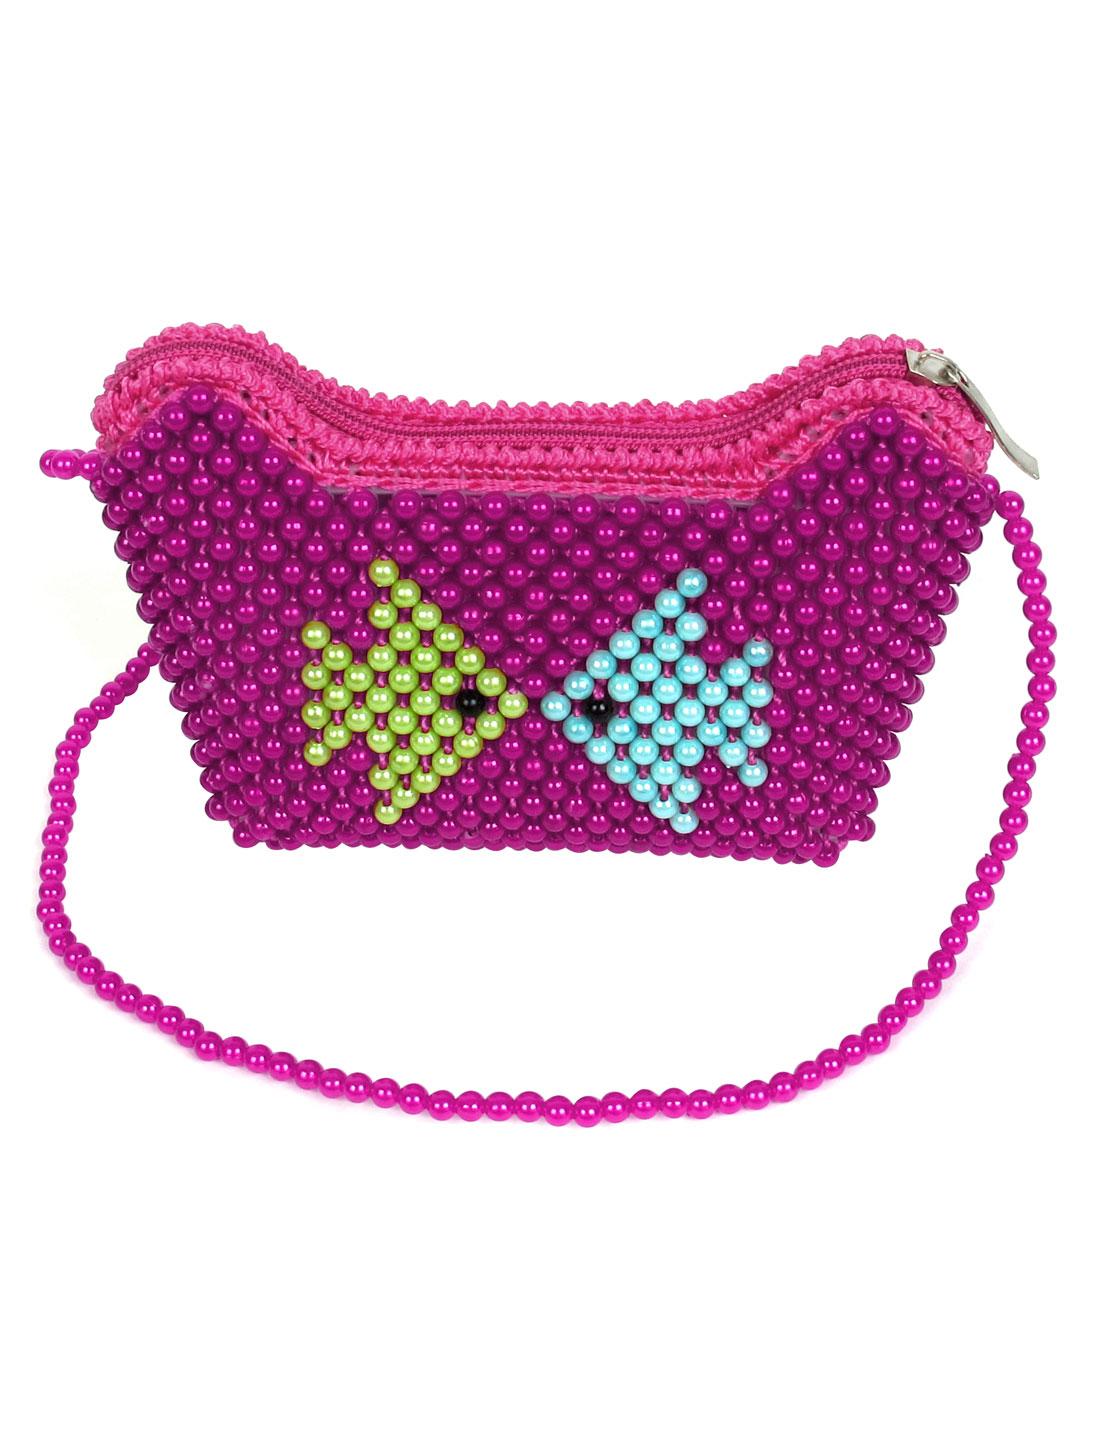 Handmade Zip Up Women Lady Fuchsia Faux Pearl Covered Bag Tote Handbag